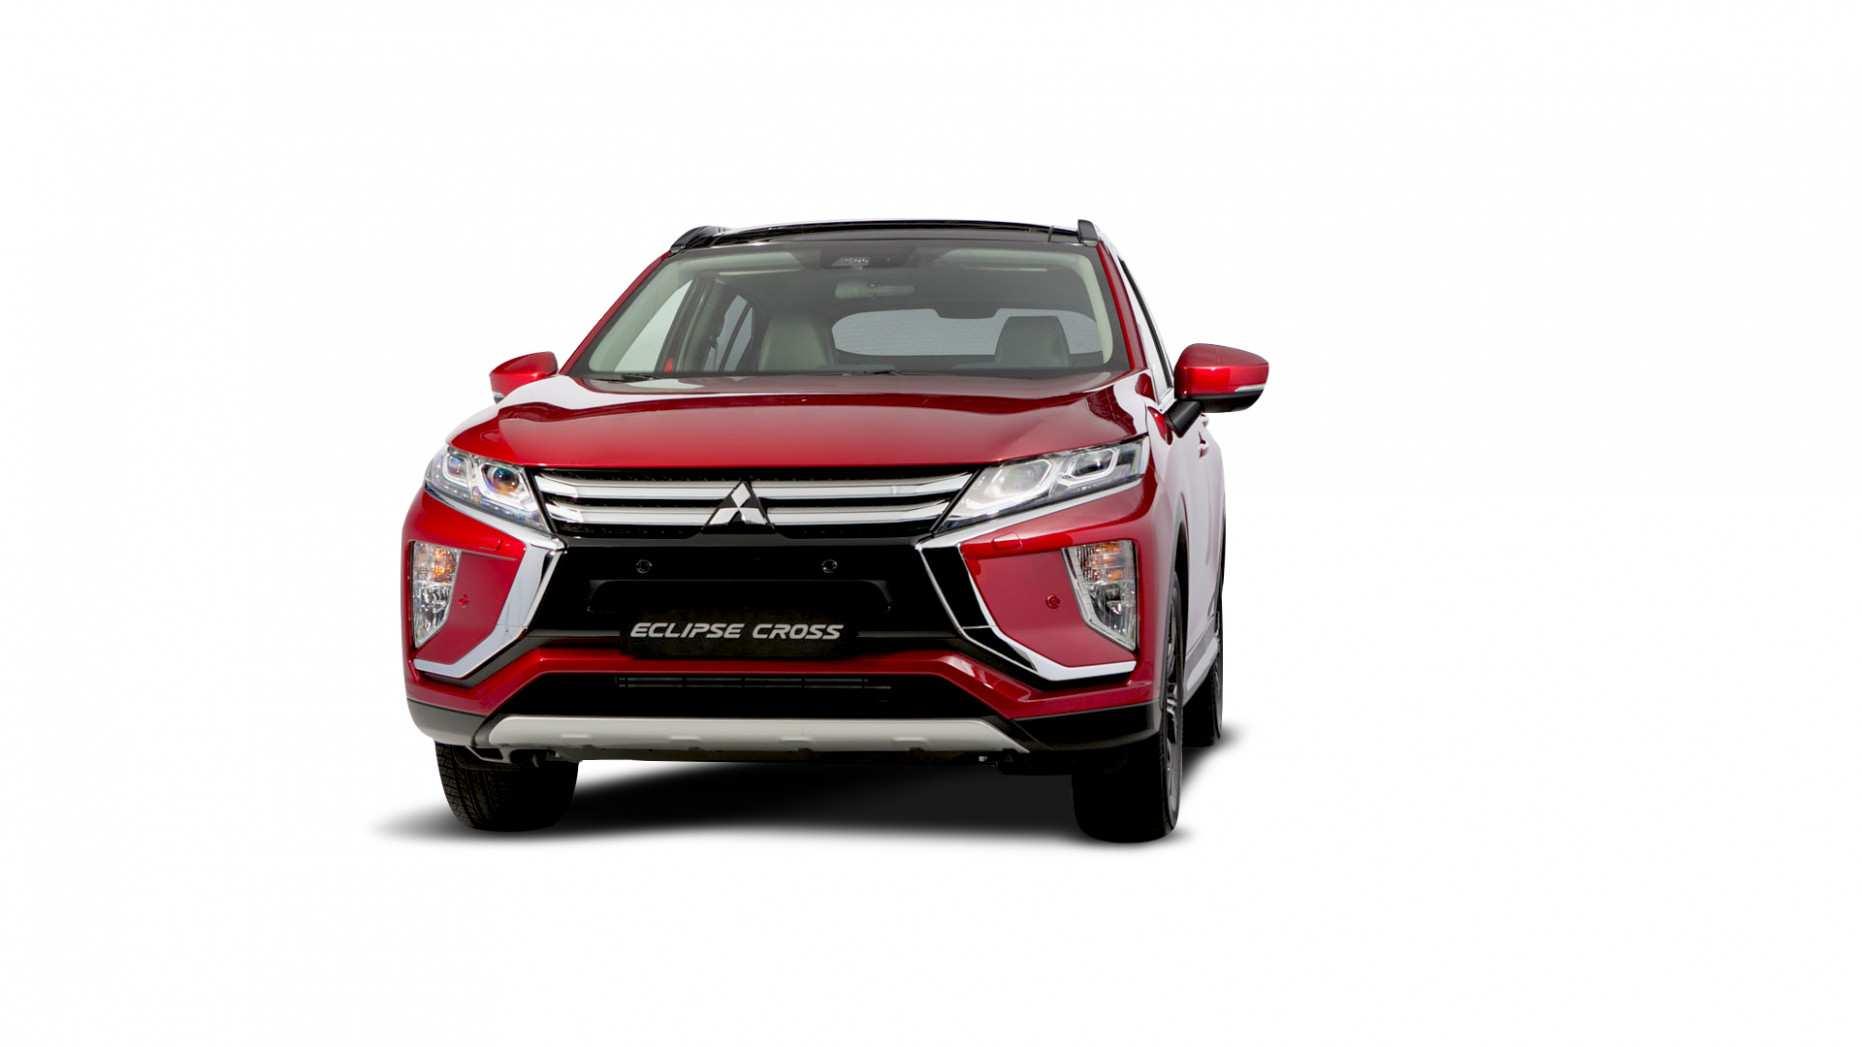 37 All New Mitsubishi Asx 2020 Dane Techniczne Rumors with Mitsubishi Asx 2020 Dane Techniczne